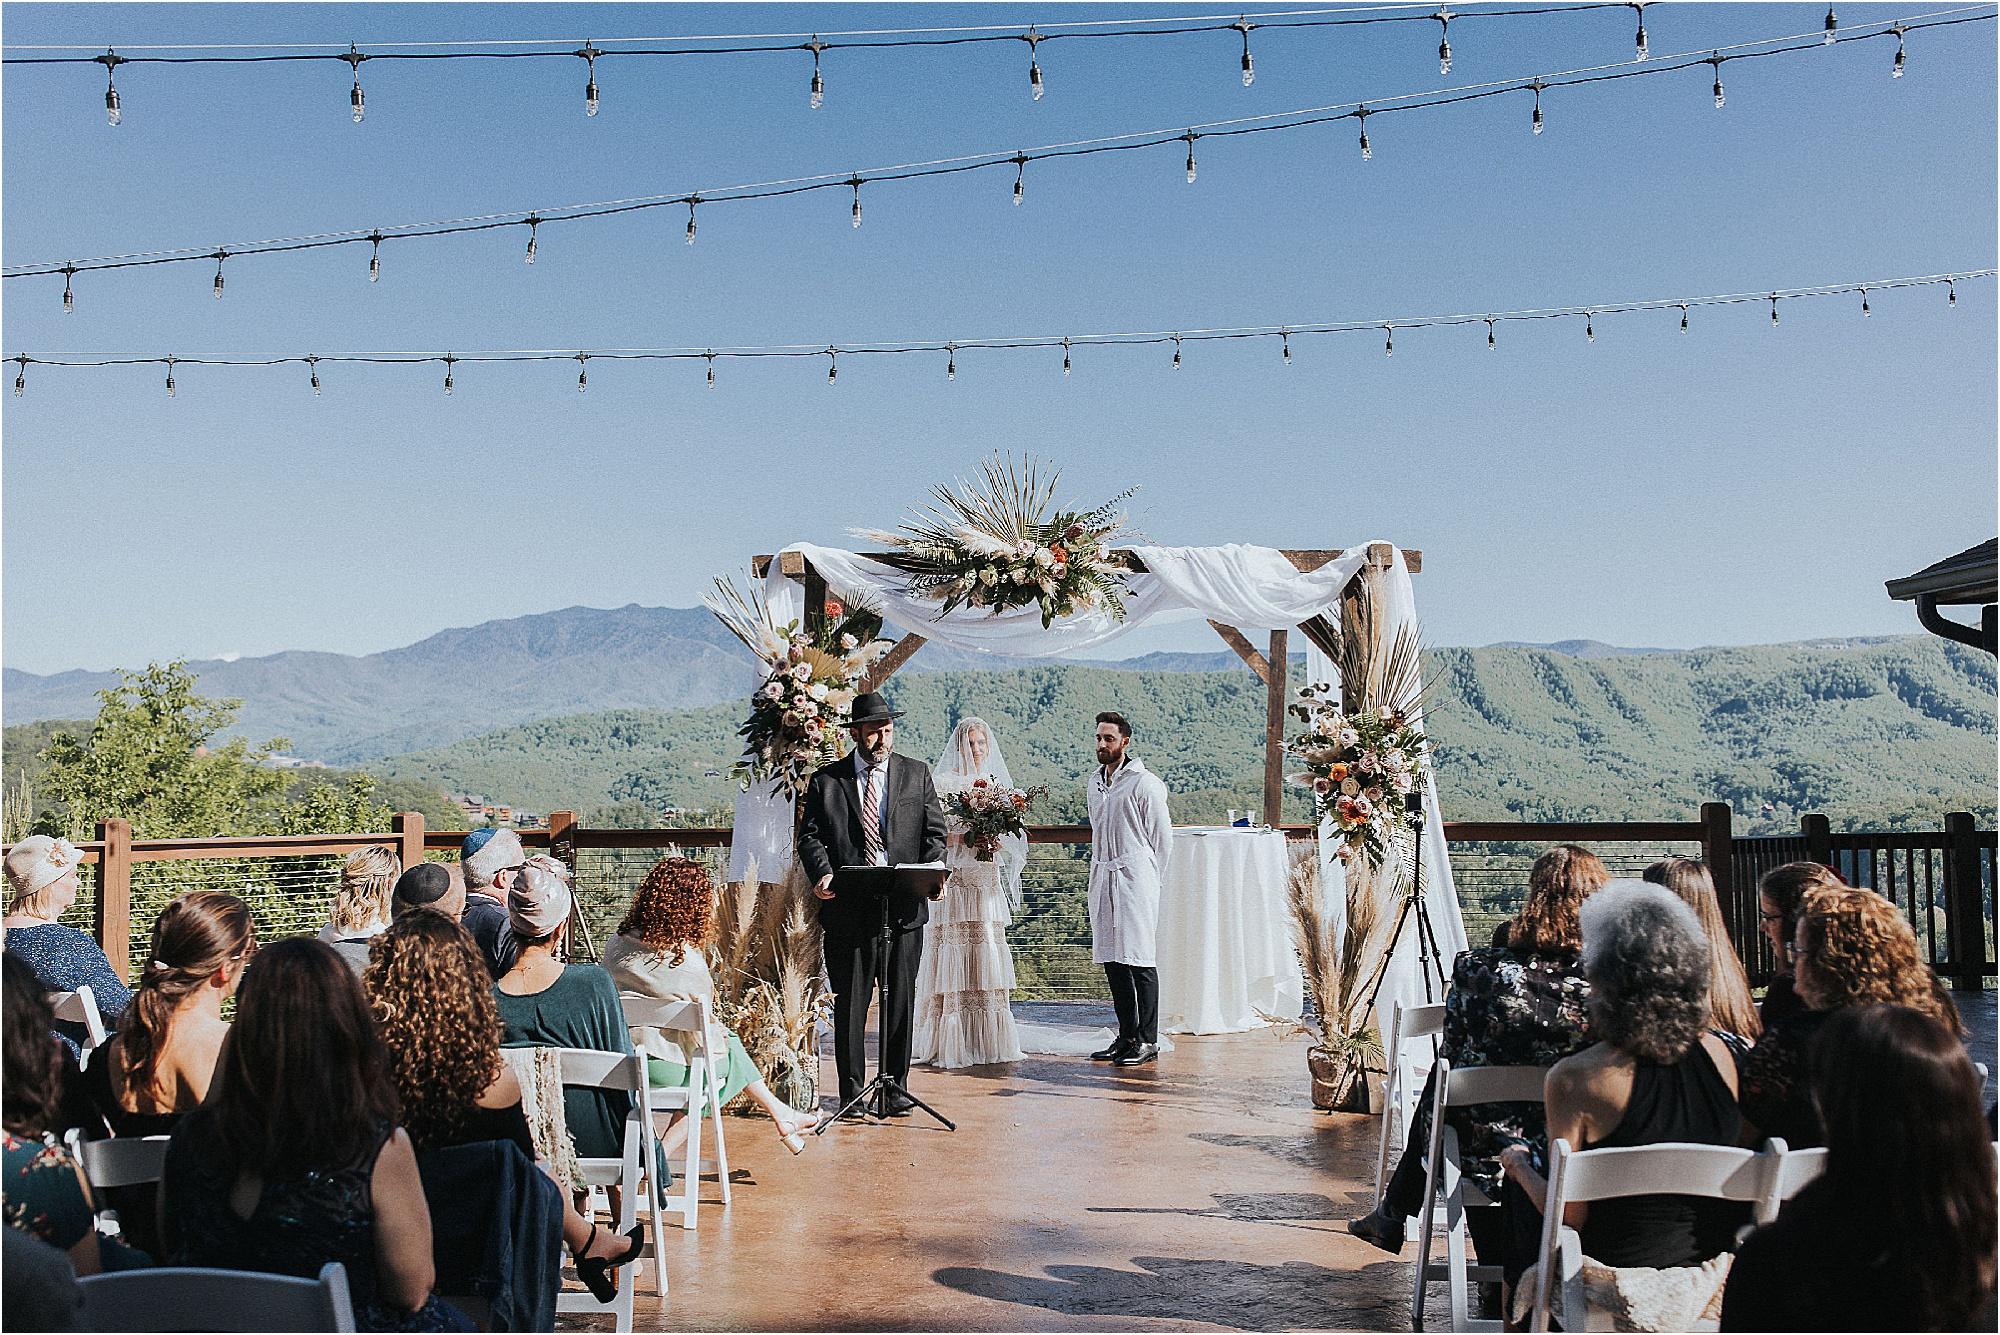 Joyful Jewish Wedding Overlooking The Great Outdoors